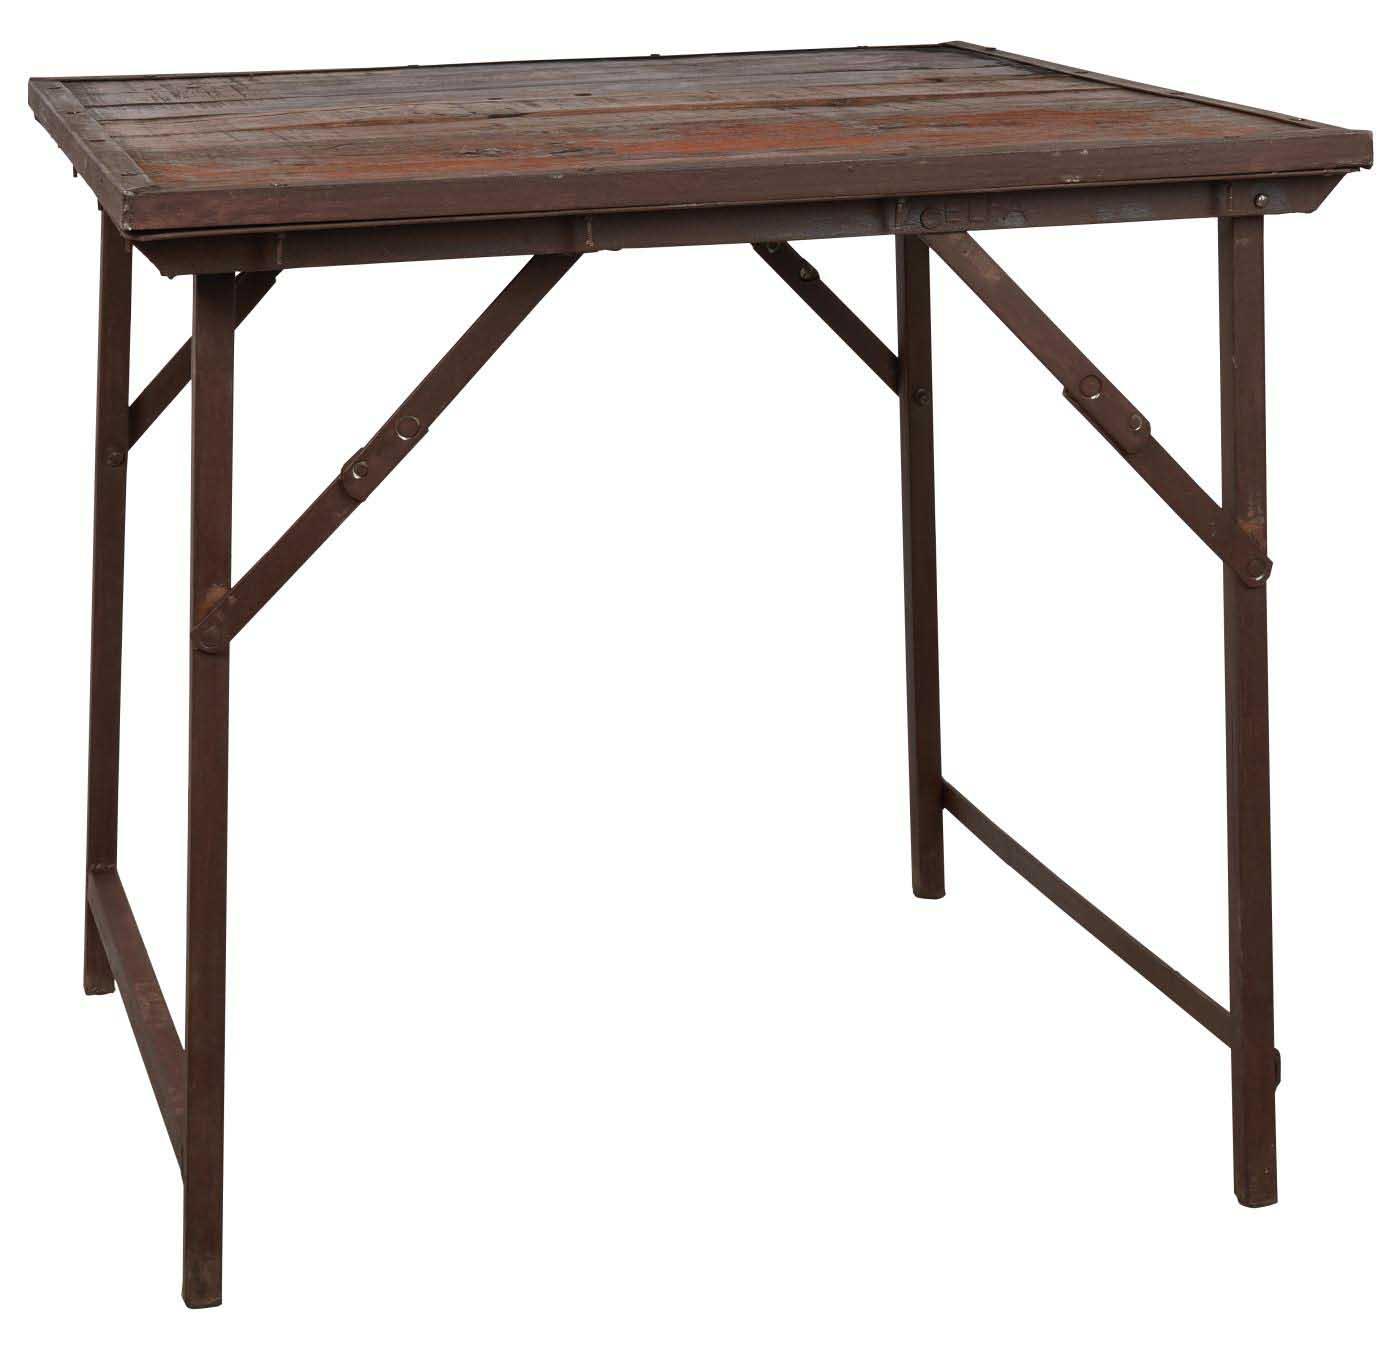 IB LAURSEN Unika cafébord - genbrugstræ, metalstel